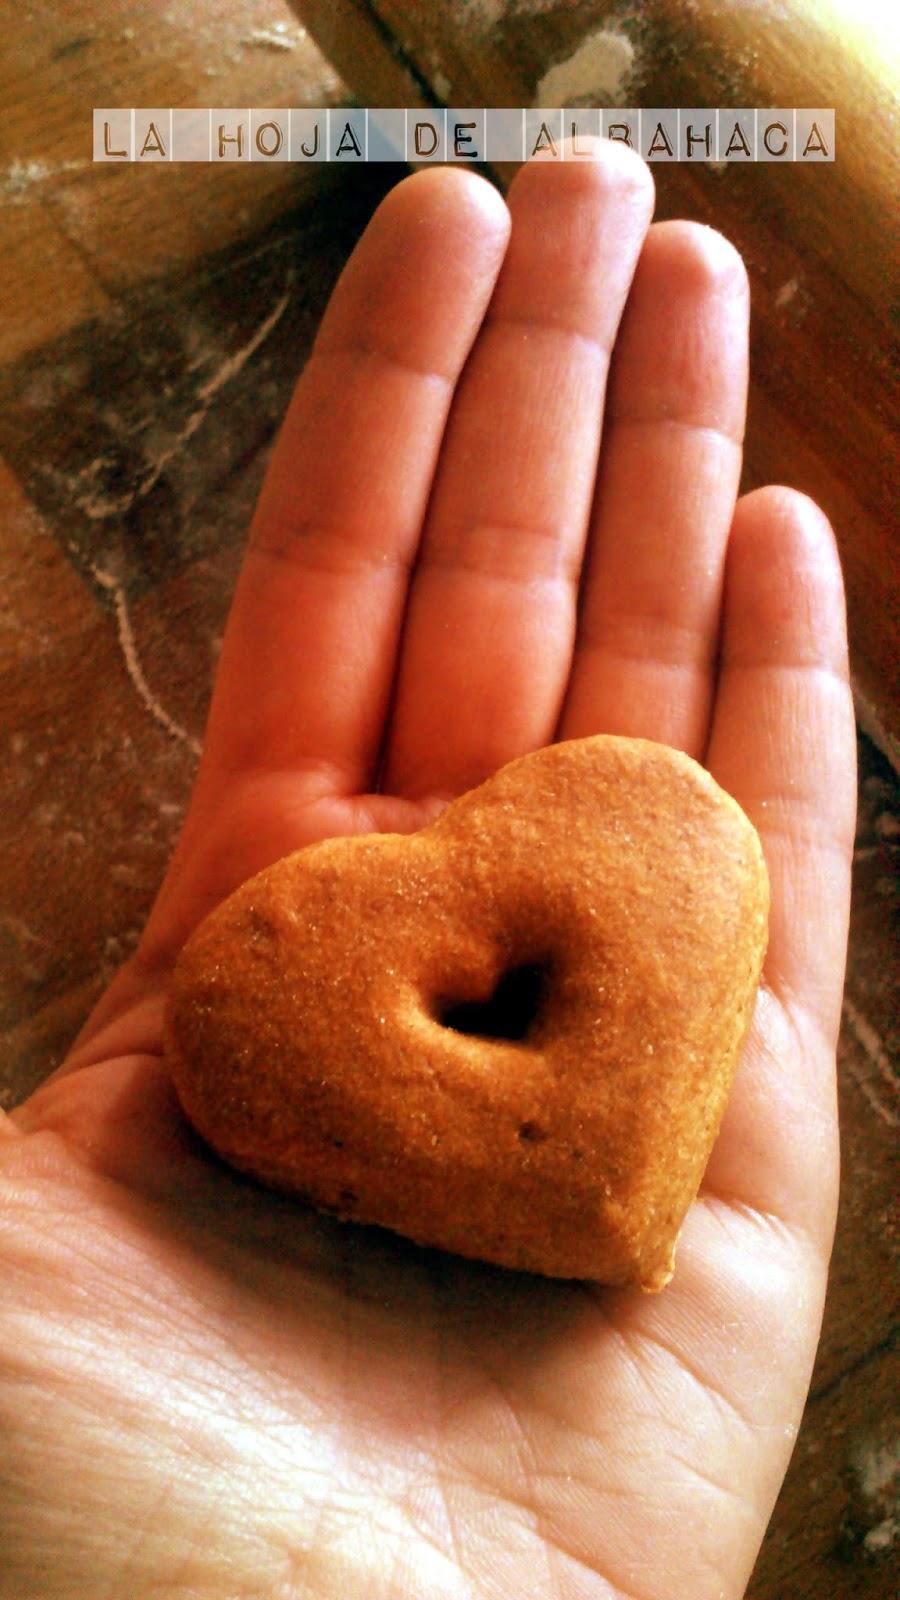 galletas veganas, jengibre, postres sin lactosa, intolerancia a la lactosa, silikomart, wonder cakes cutter